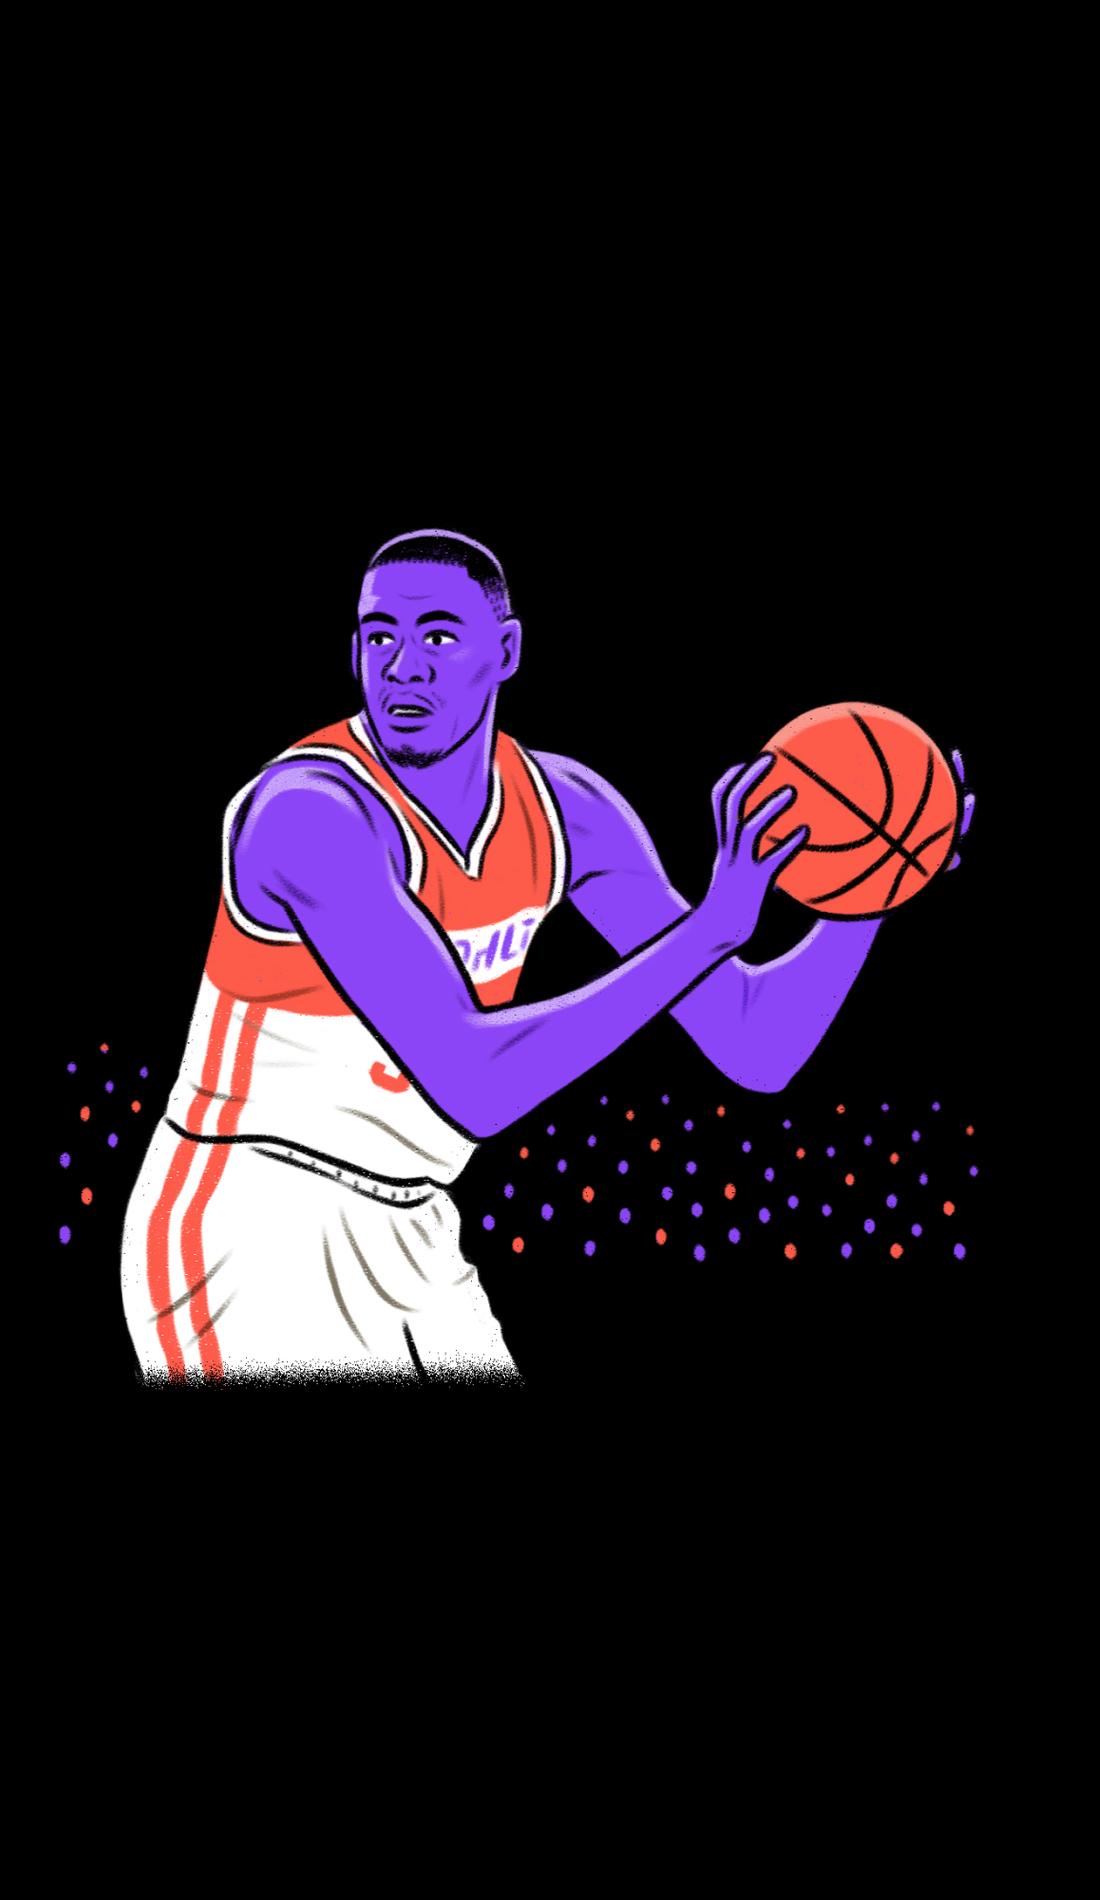 A Omaha Mavericks Basketball live event